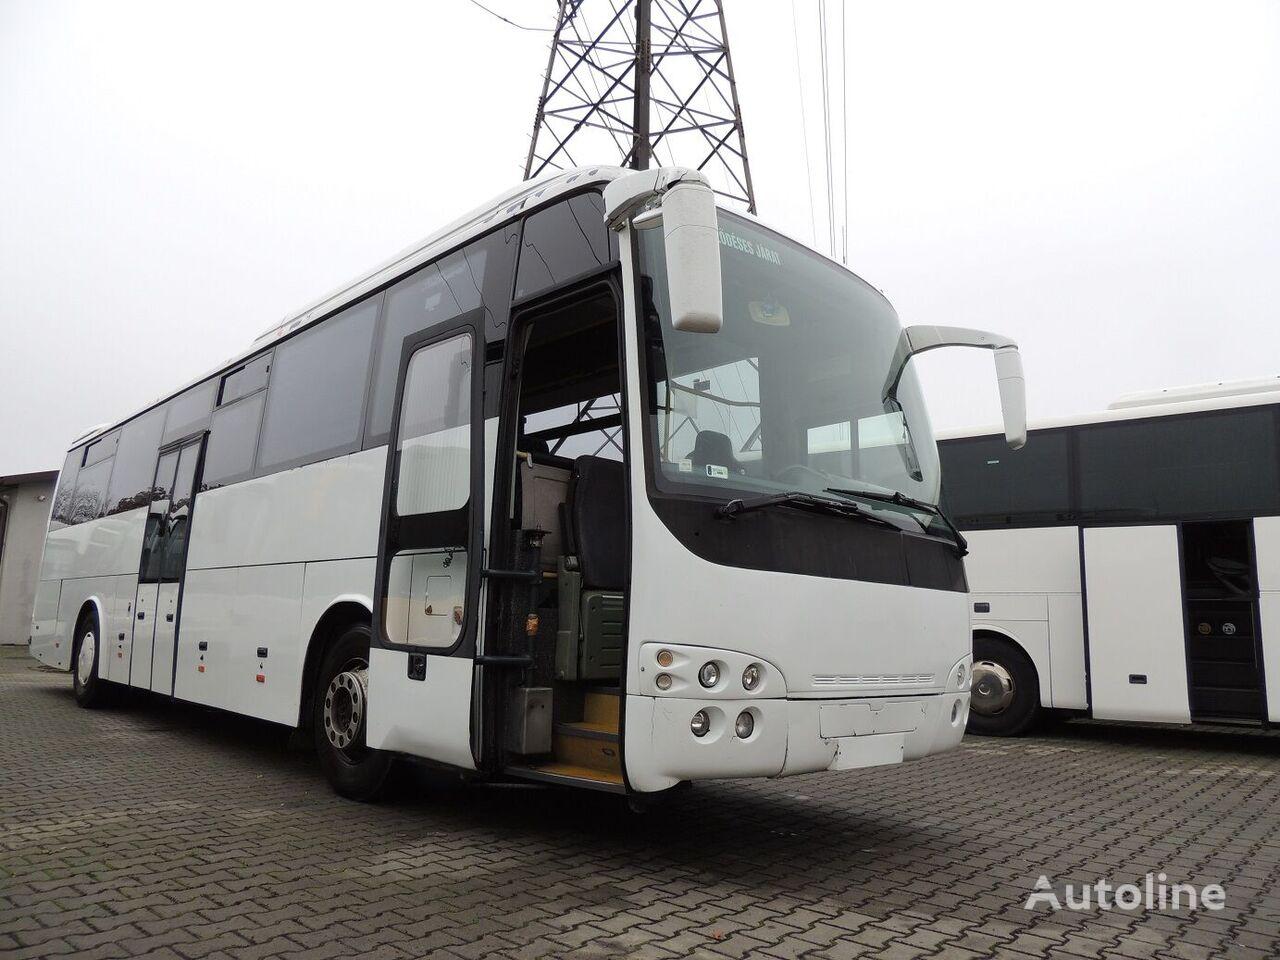 TEMSA SAFARI 12m. 55+2 coach bus